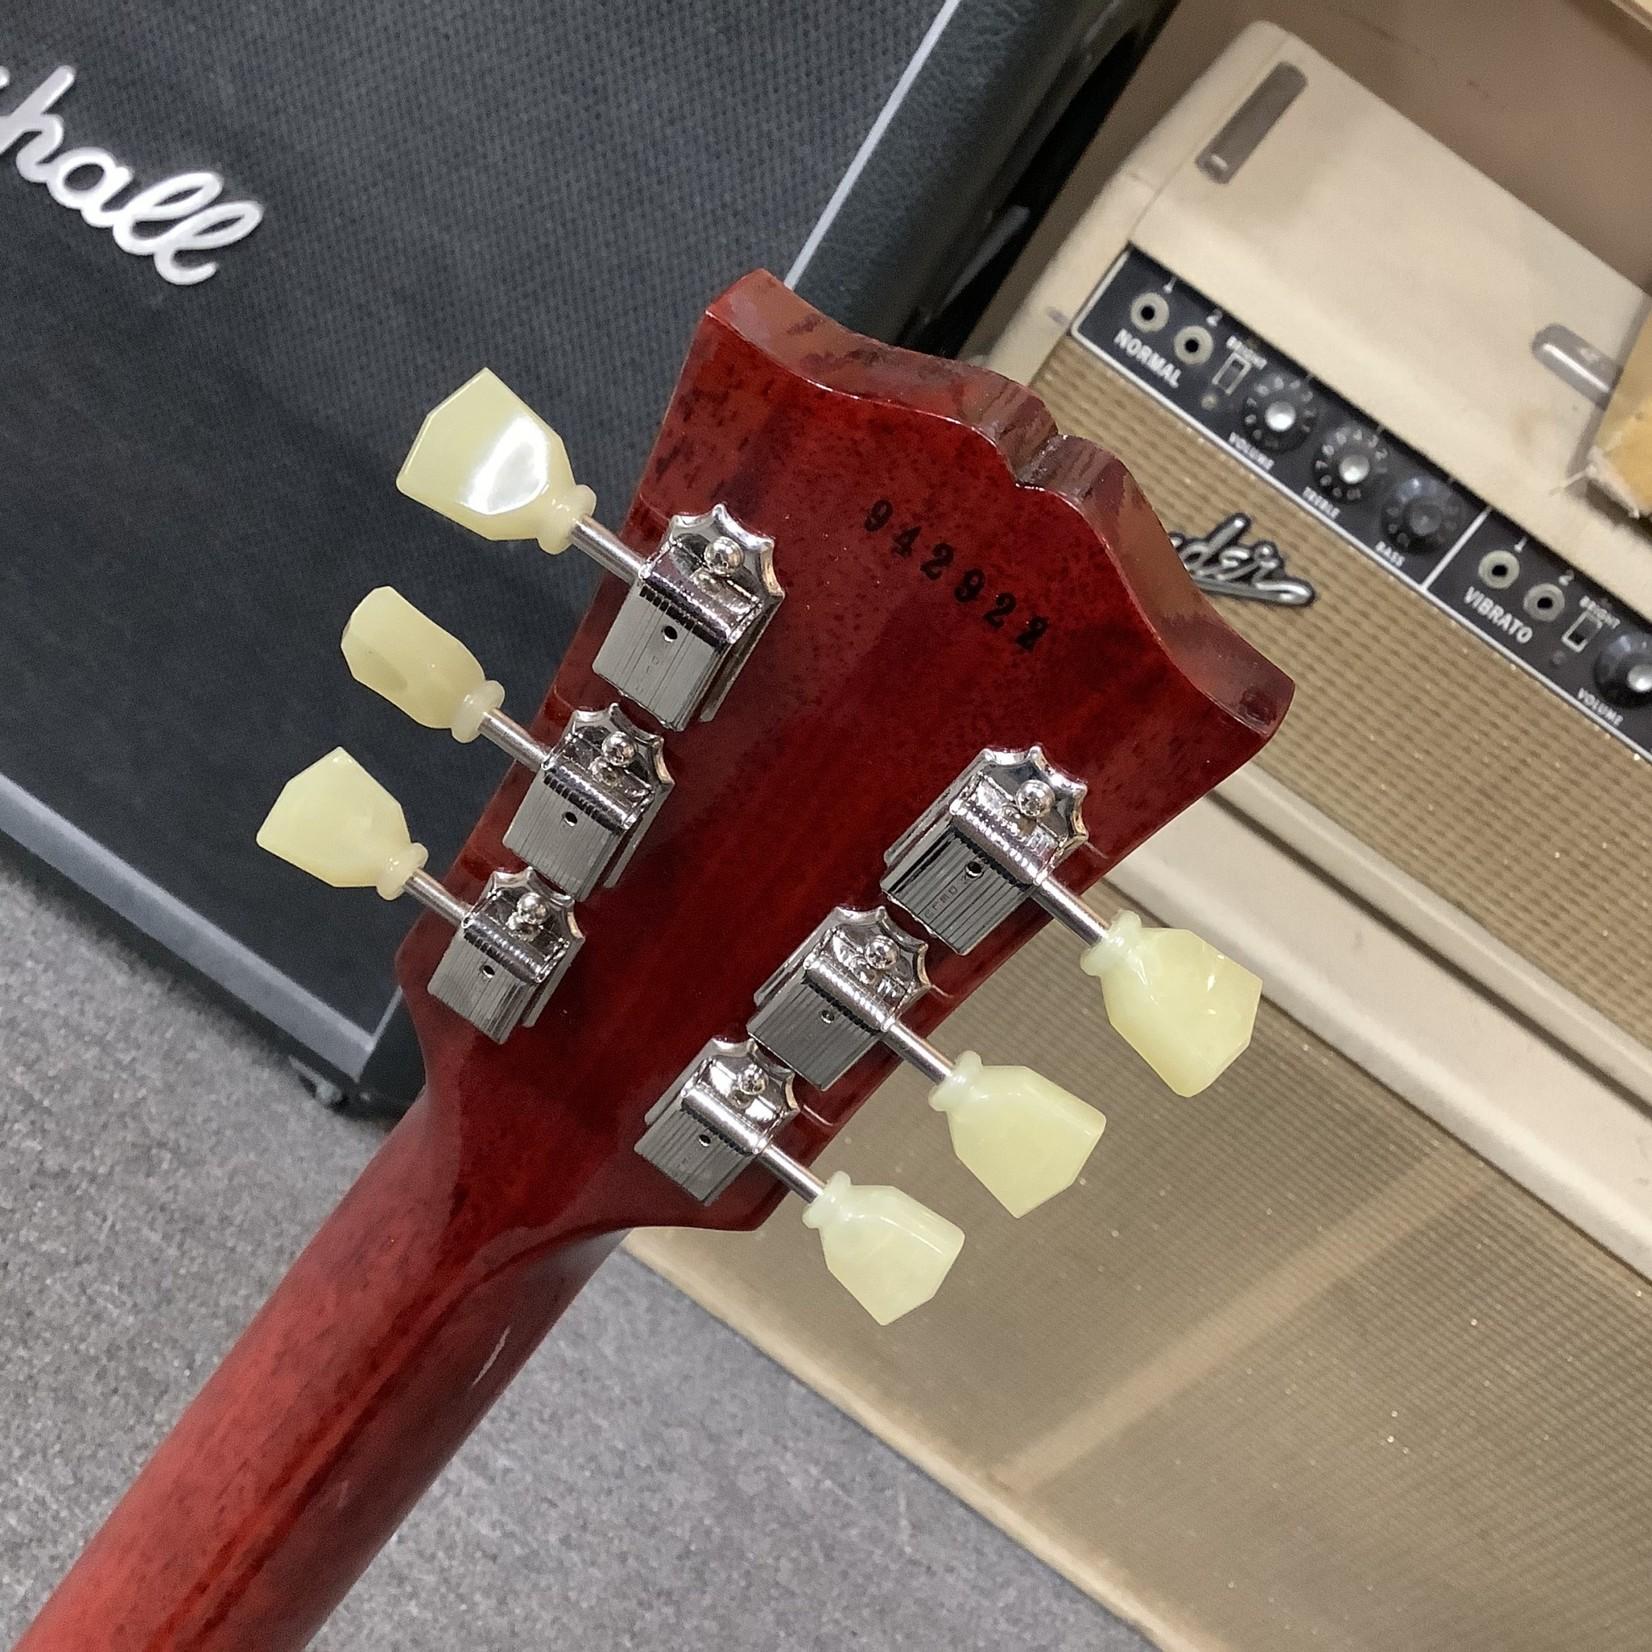 Gibson Gibson Les Paul R9 Wildwood Featherweight Flame Top Custom Humbuckers, East Coast Maple Top